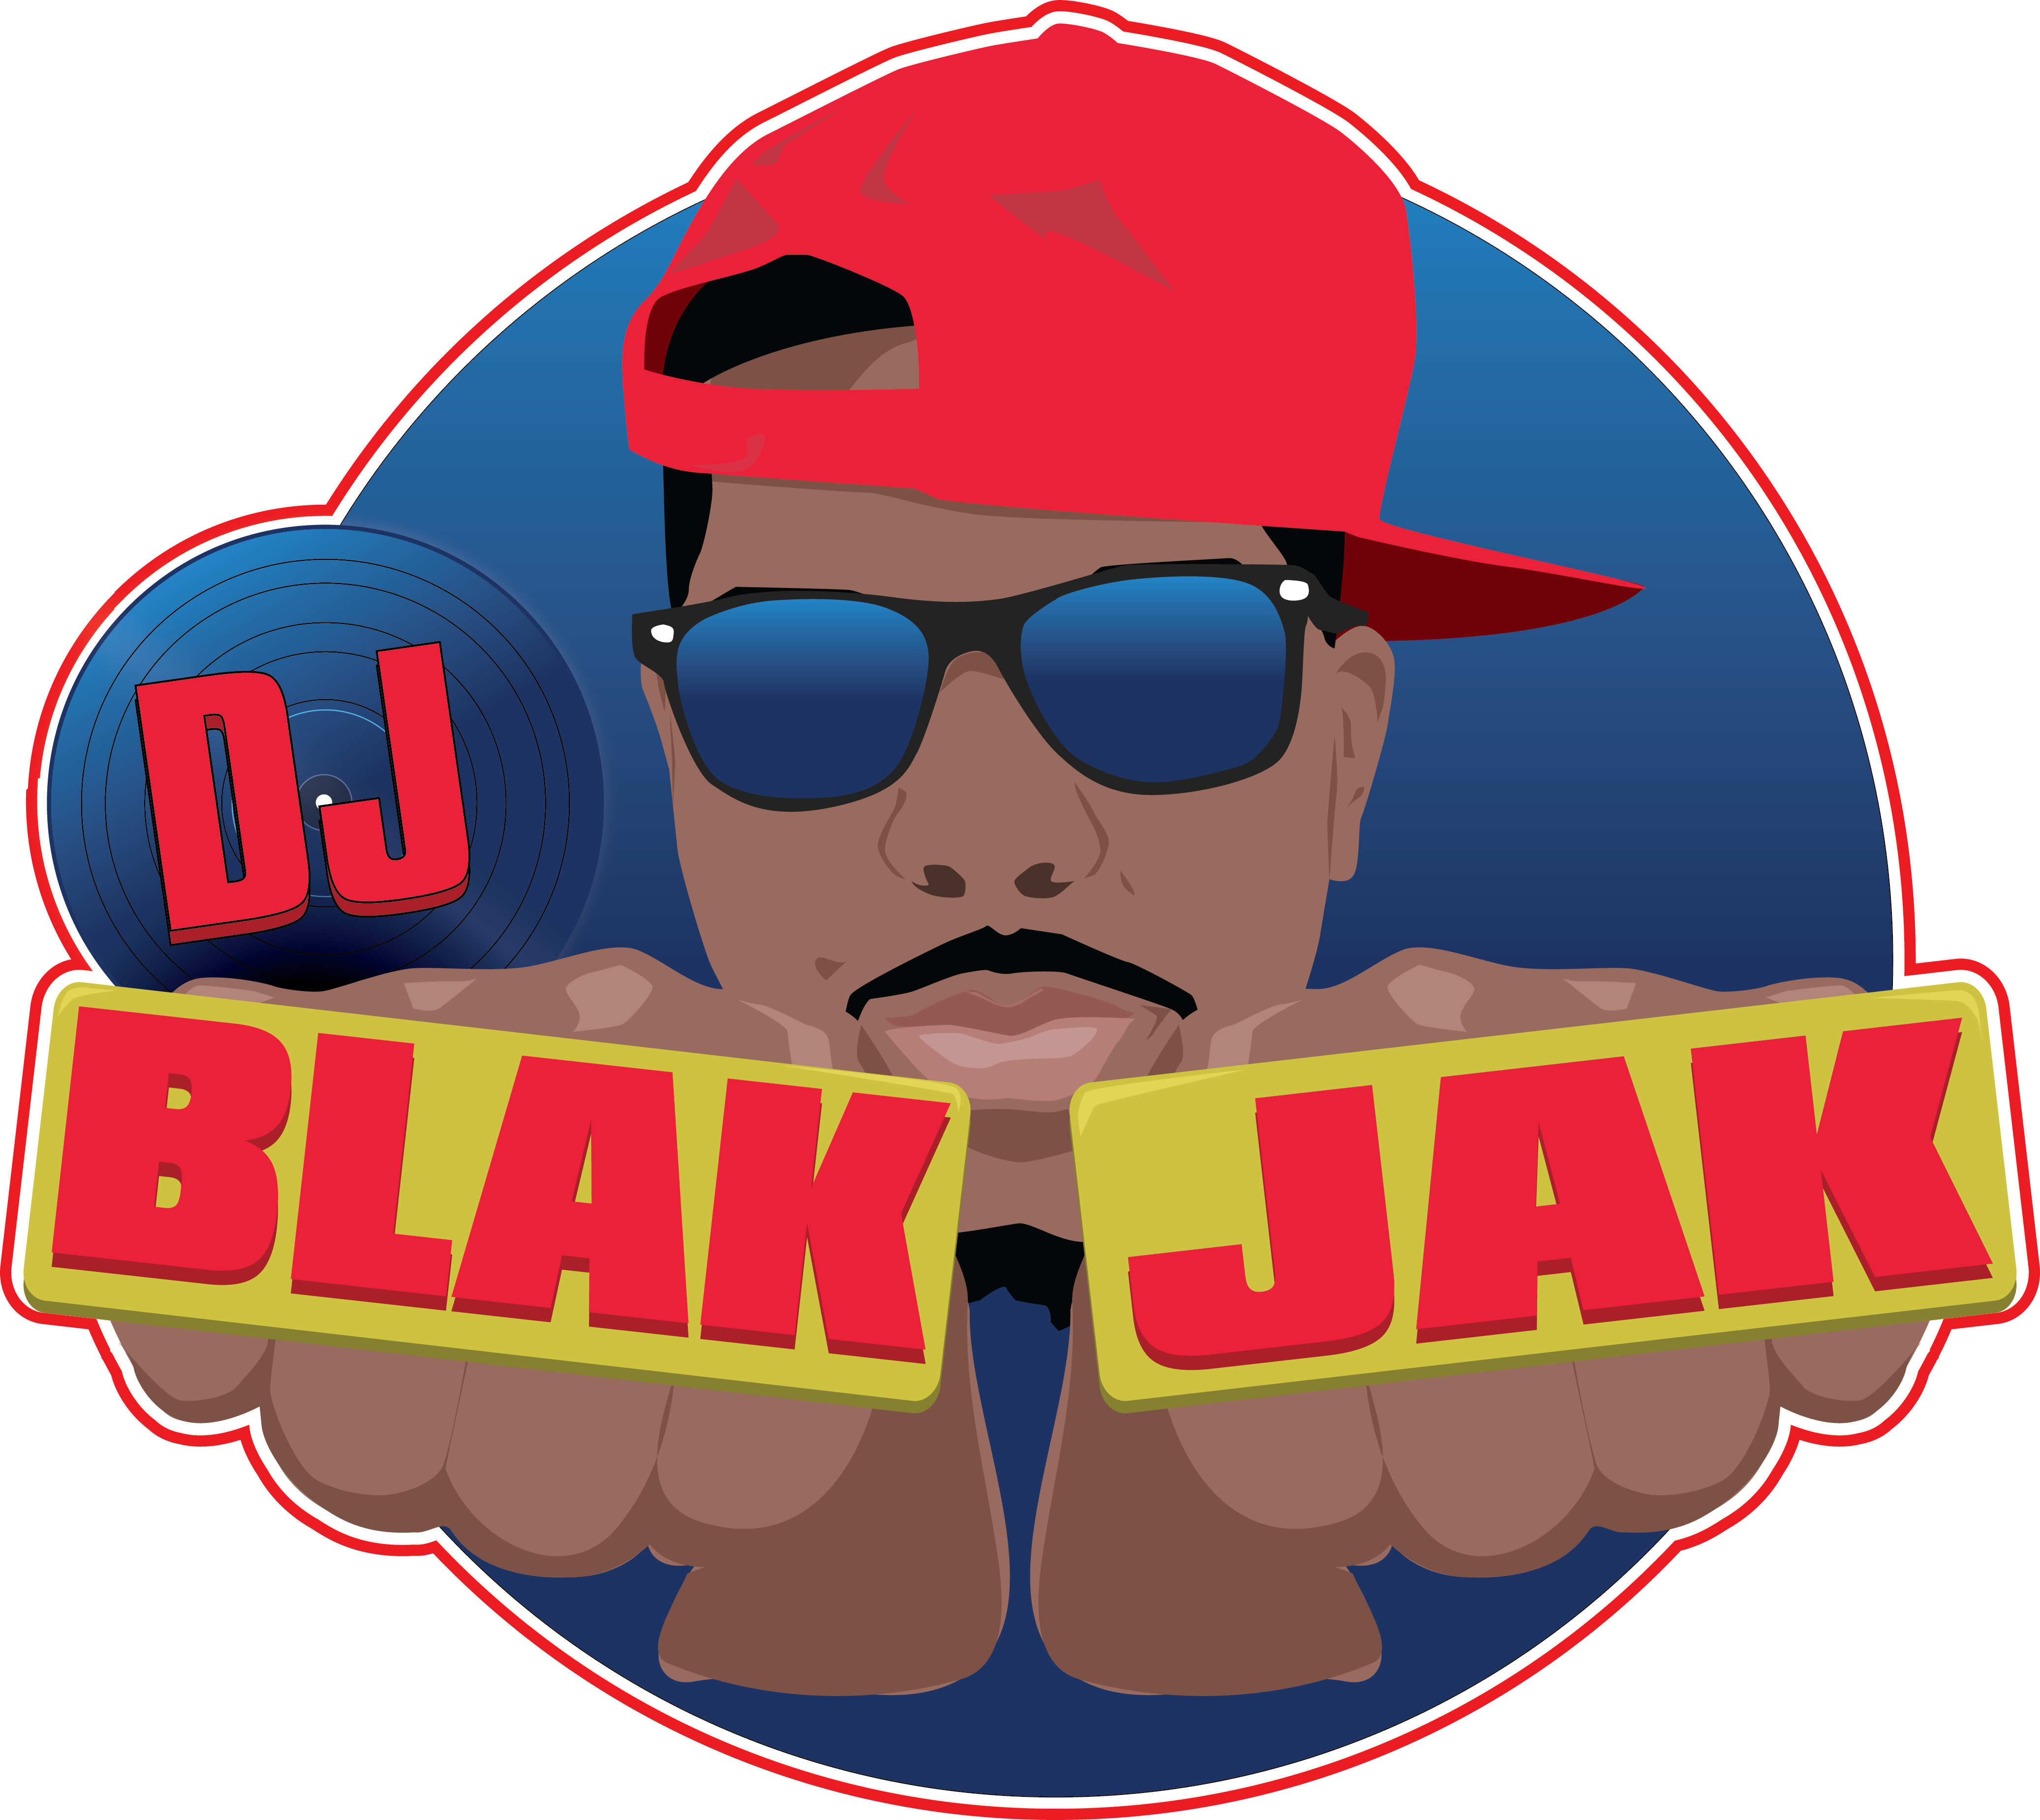 DJ BLAK JAK